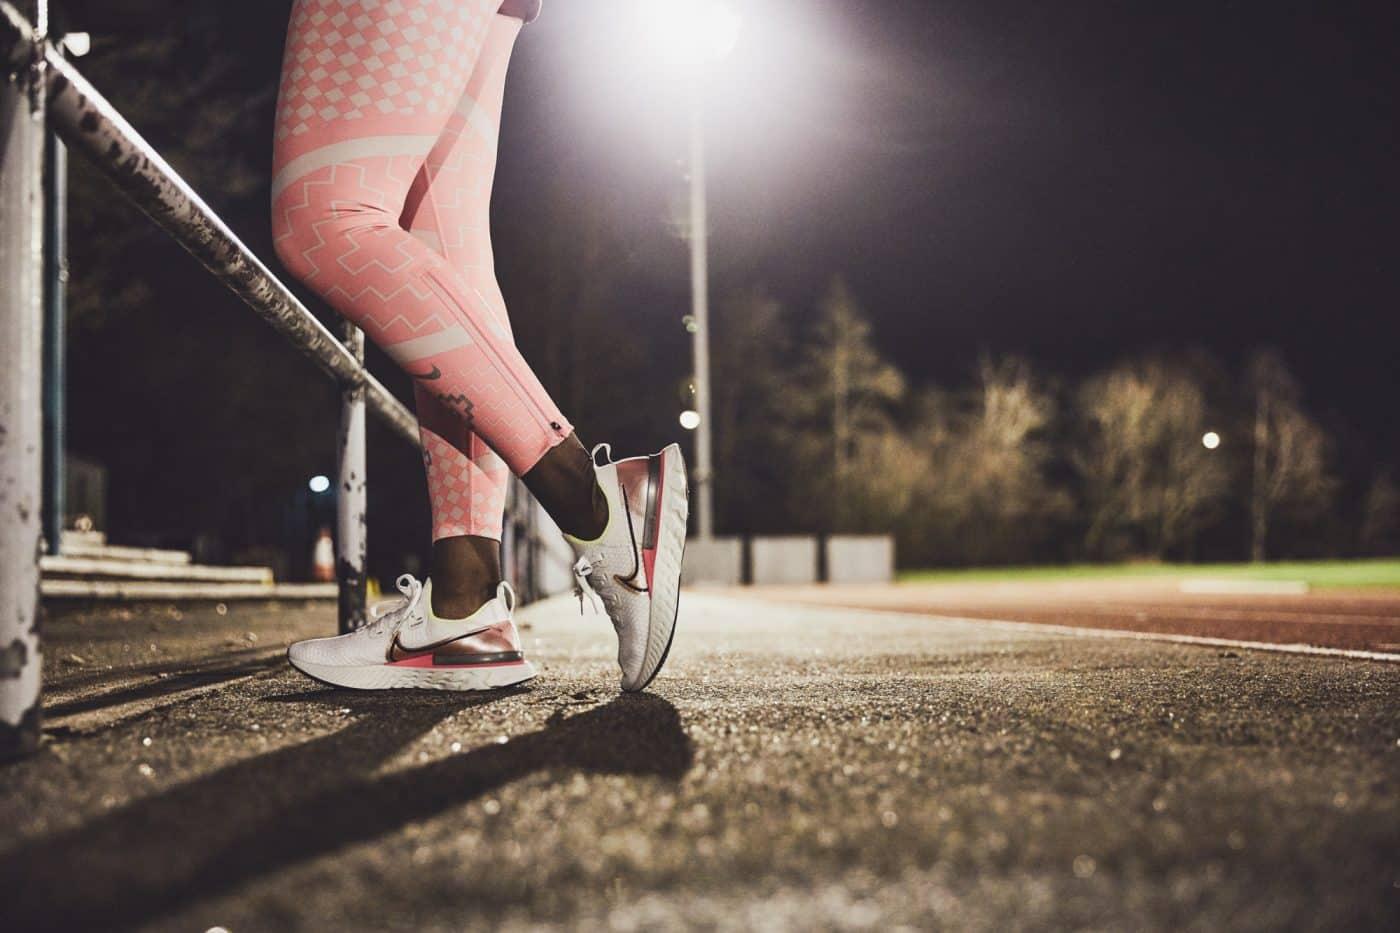 Dina-Asher-Smith-Nike-React-Infinity-Run-Runpack-Tokyo-1